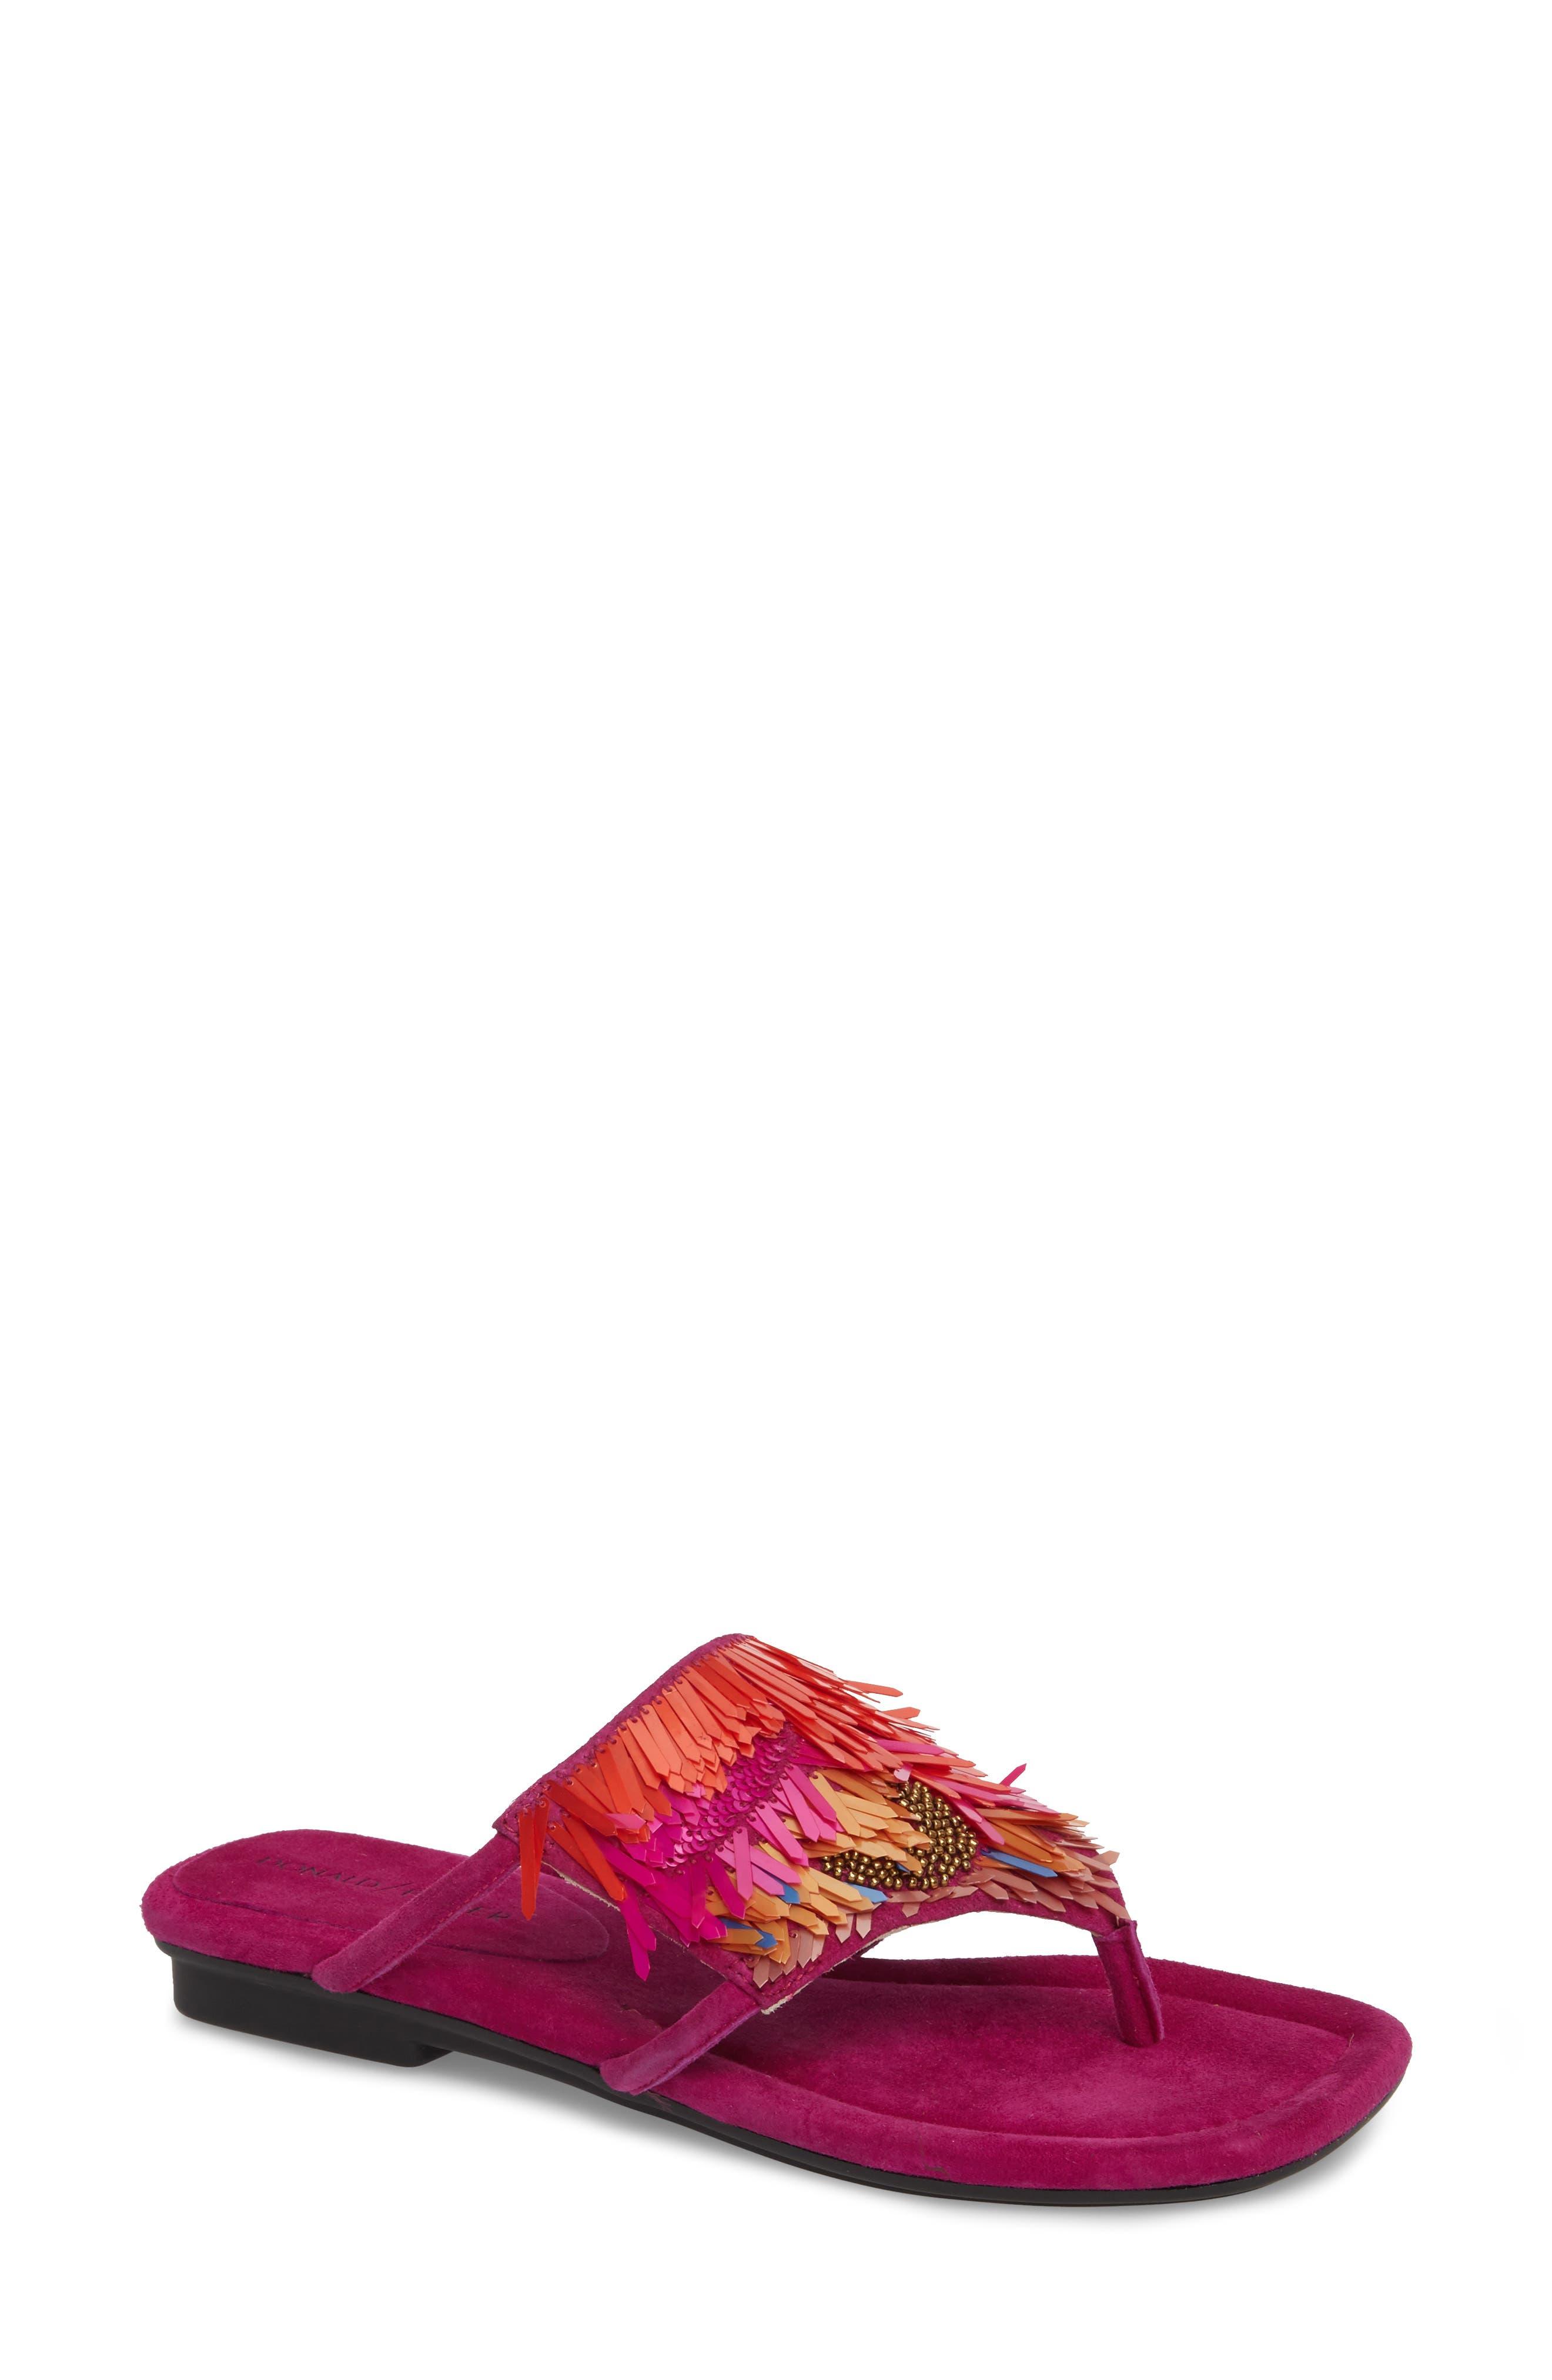 Kya Feather Sequin Sandal,                             Main thumbnail 2, color,